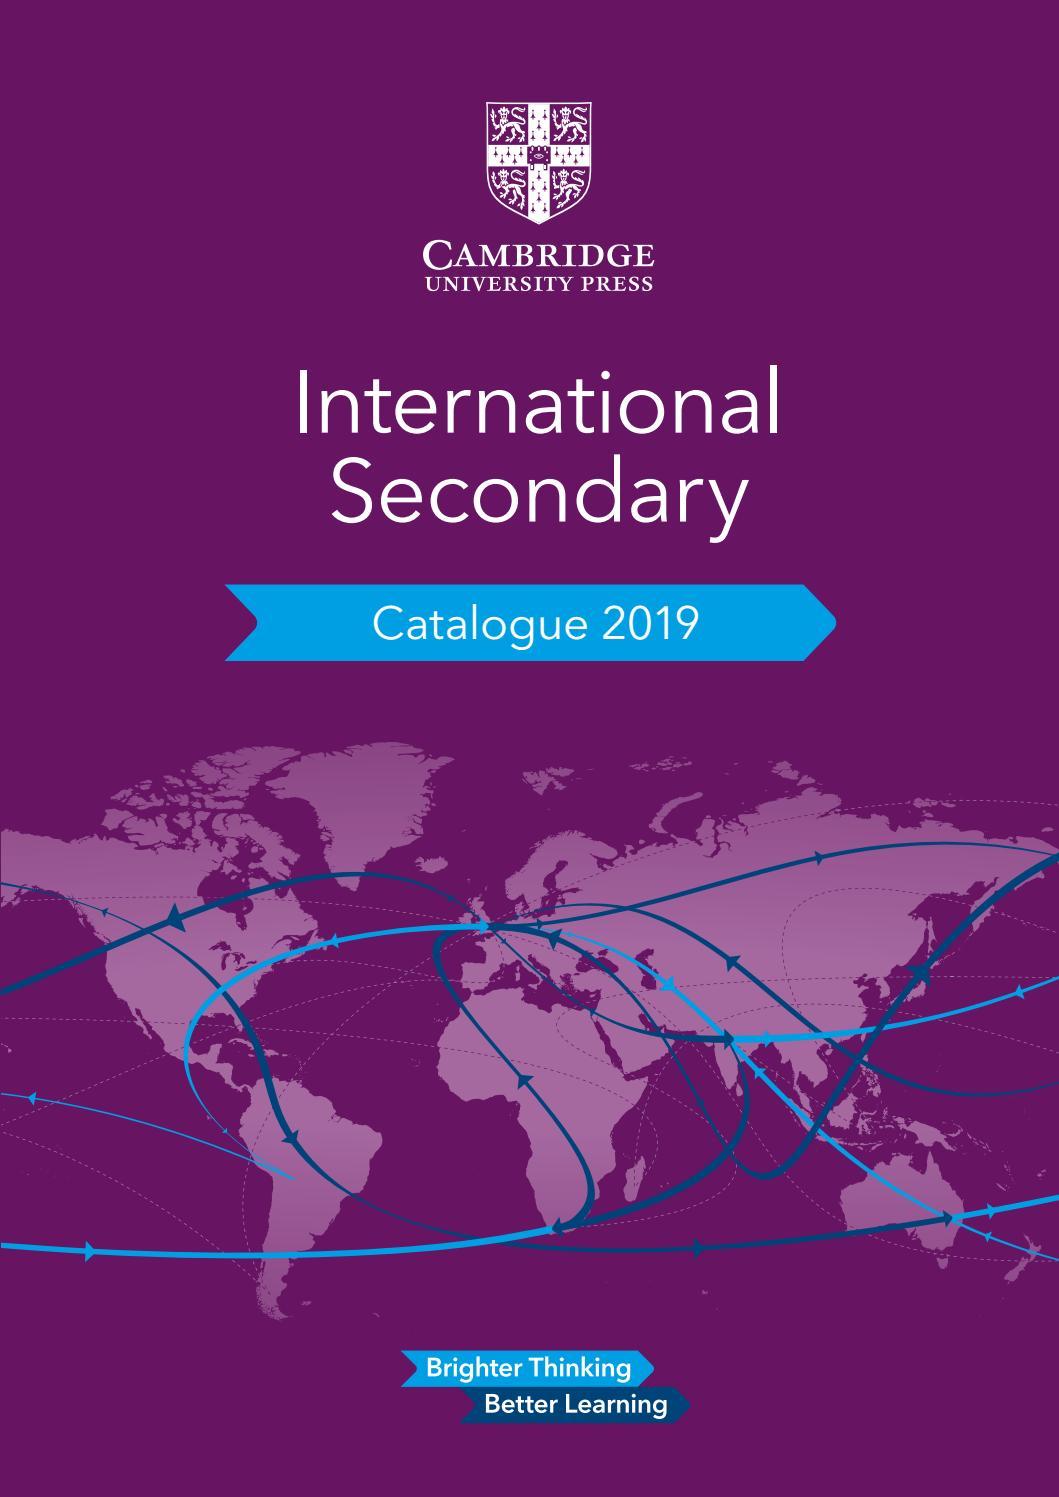 Cambridge International Secondary Catalogue 2019 by Cambridge